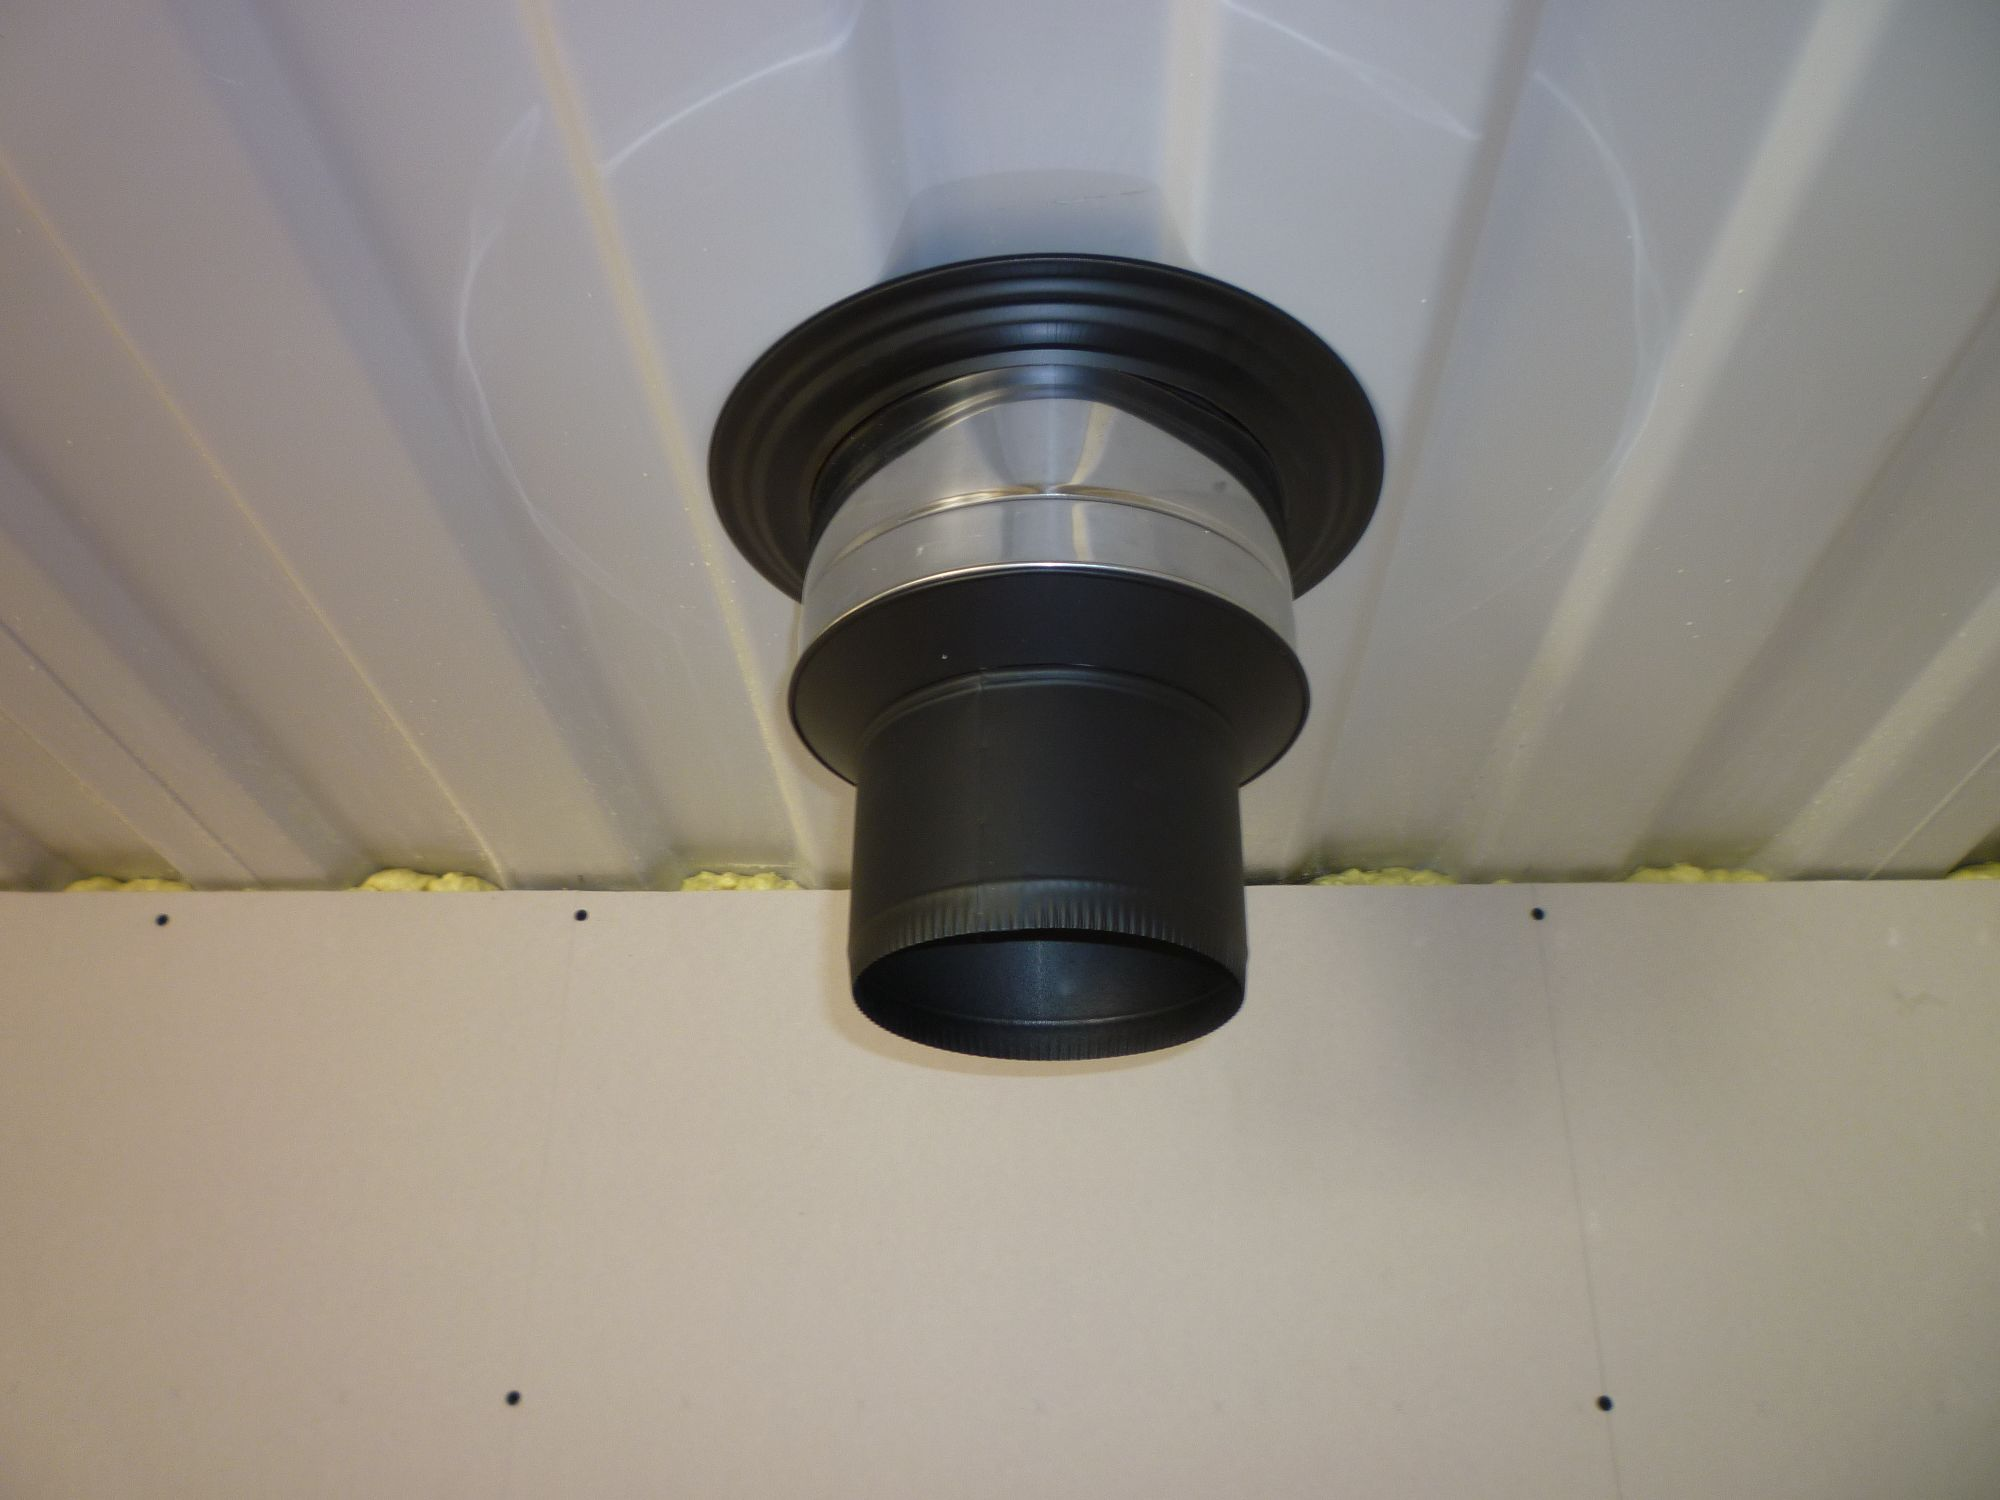 Stove Chimney: Install Stove Chimney Pipe